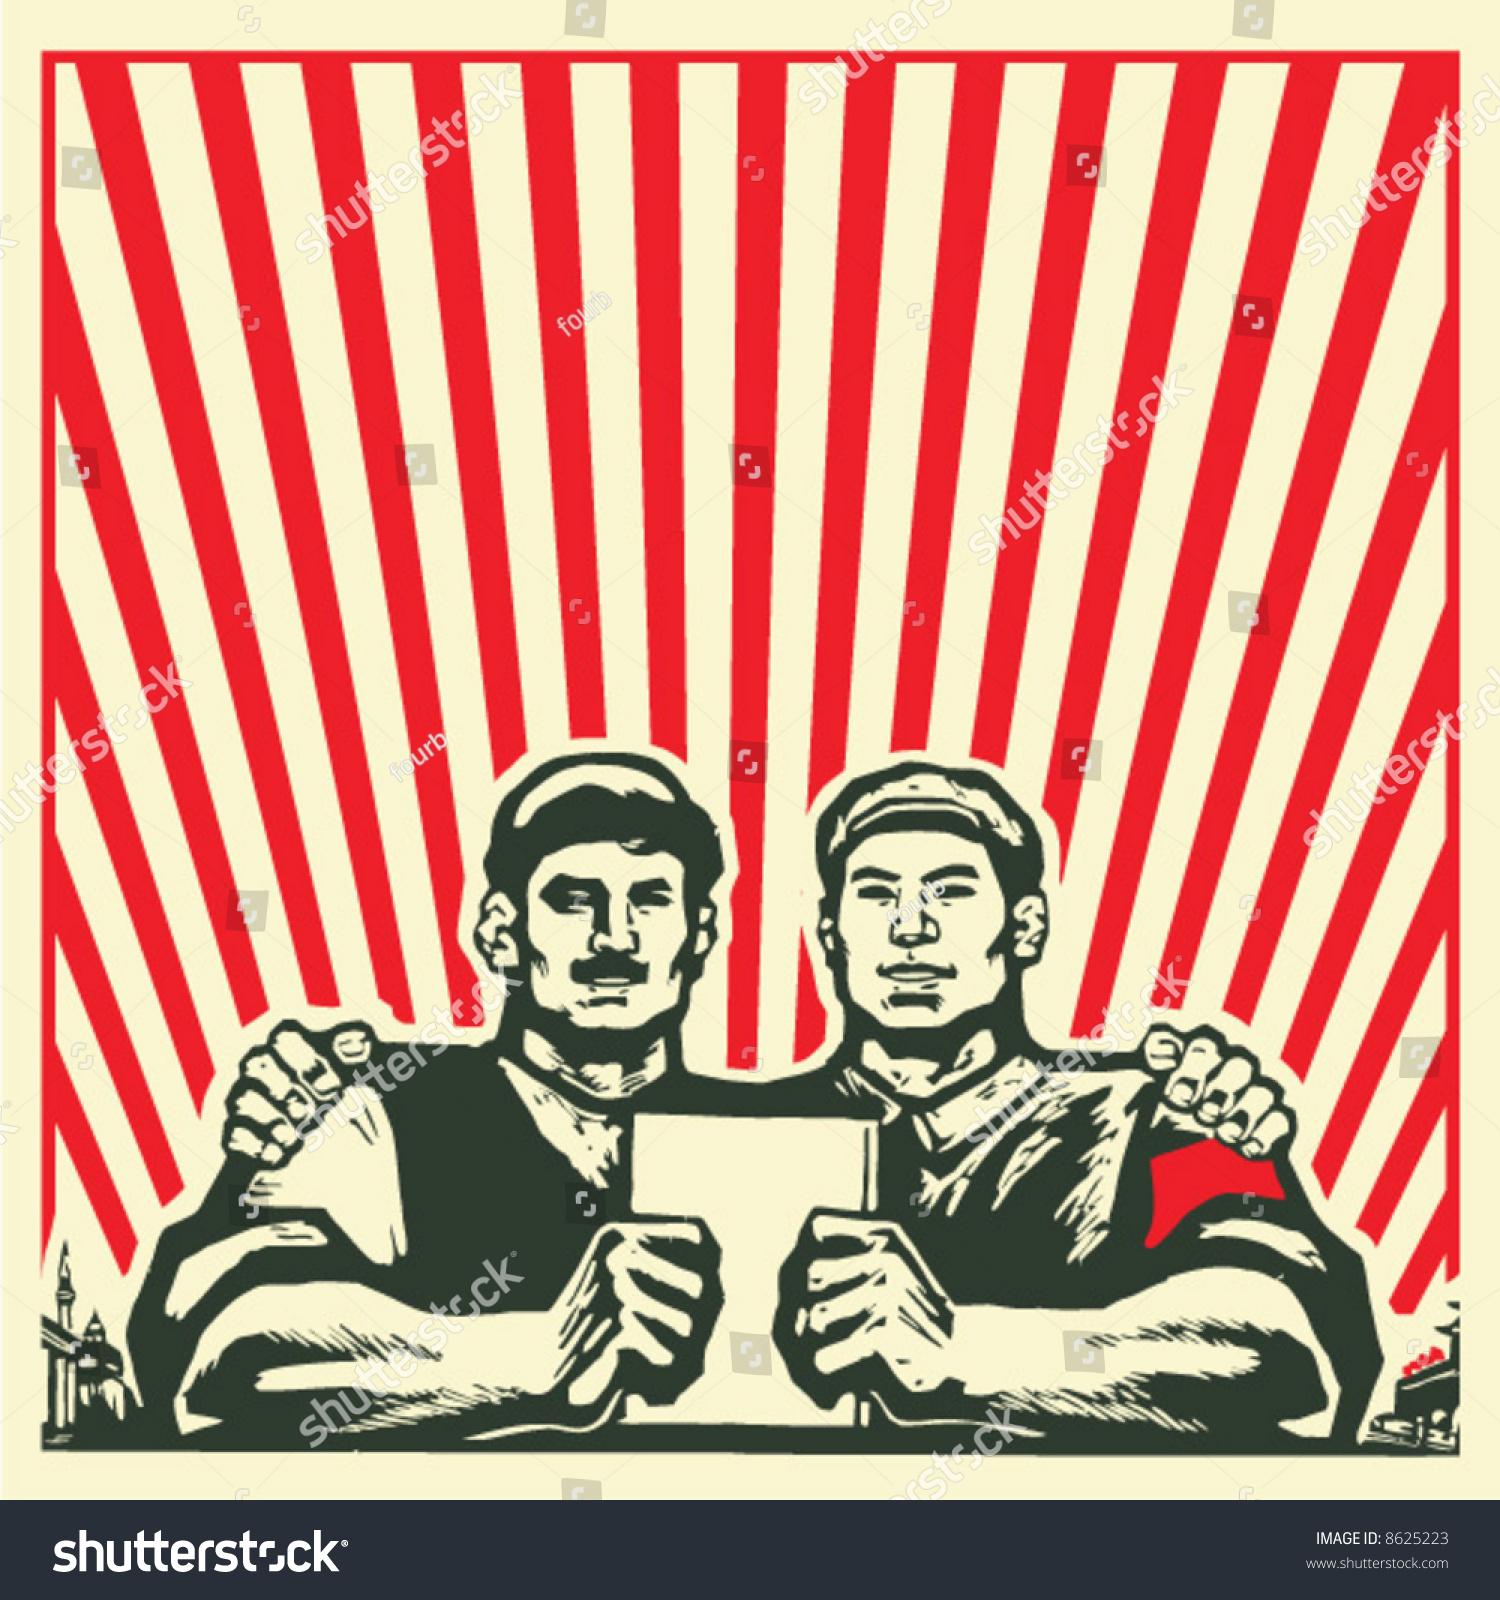 Old Communism Poster Stock Vector 8625223 - Shutterstock